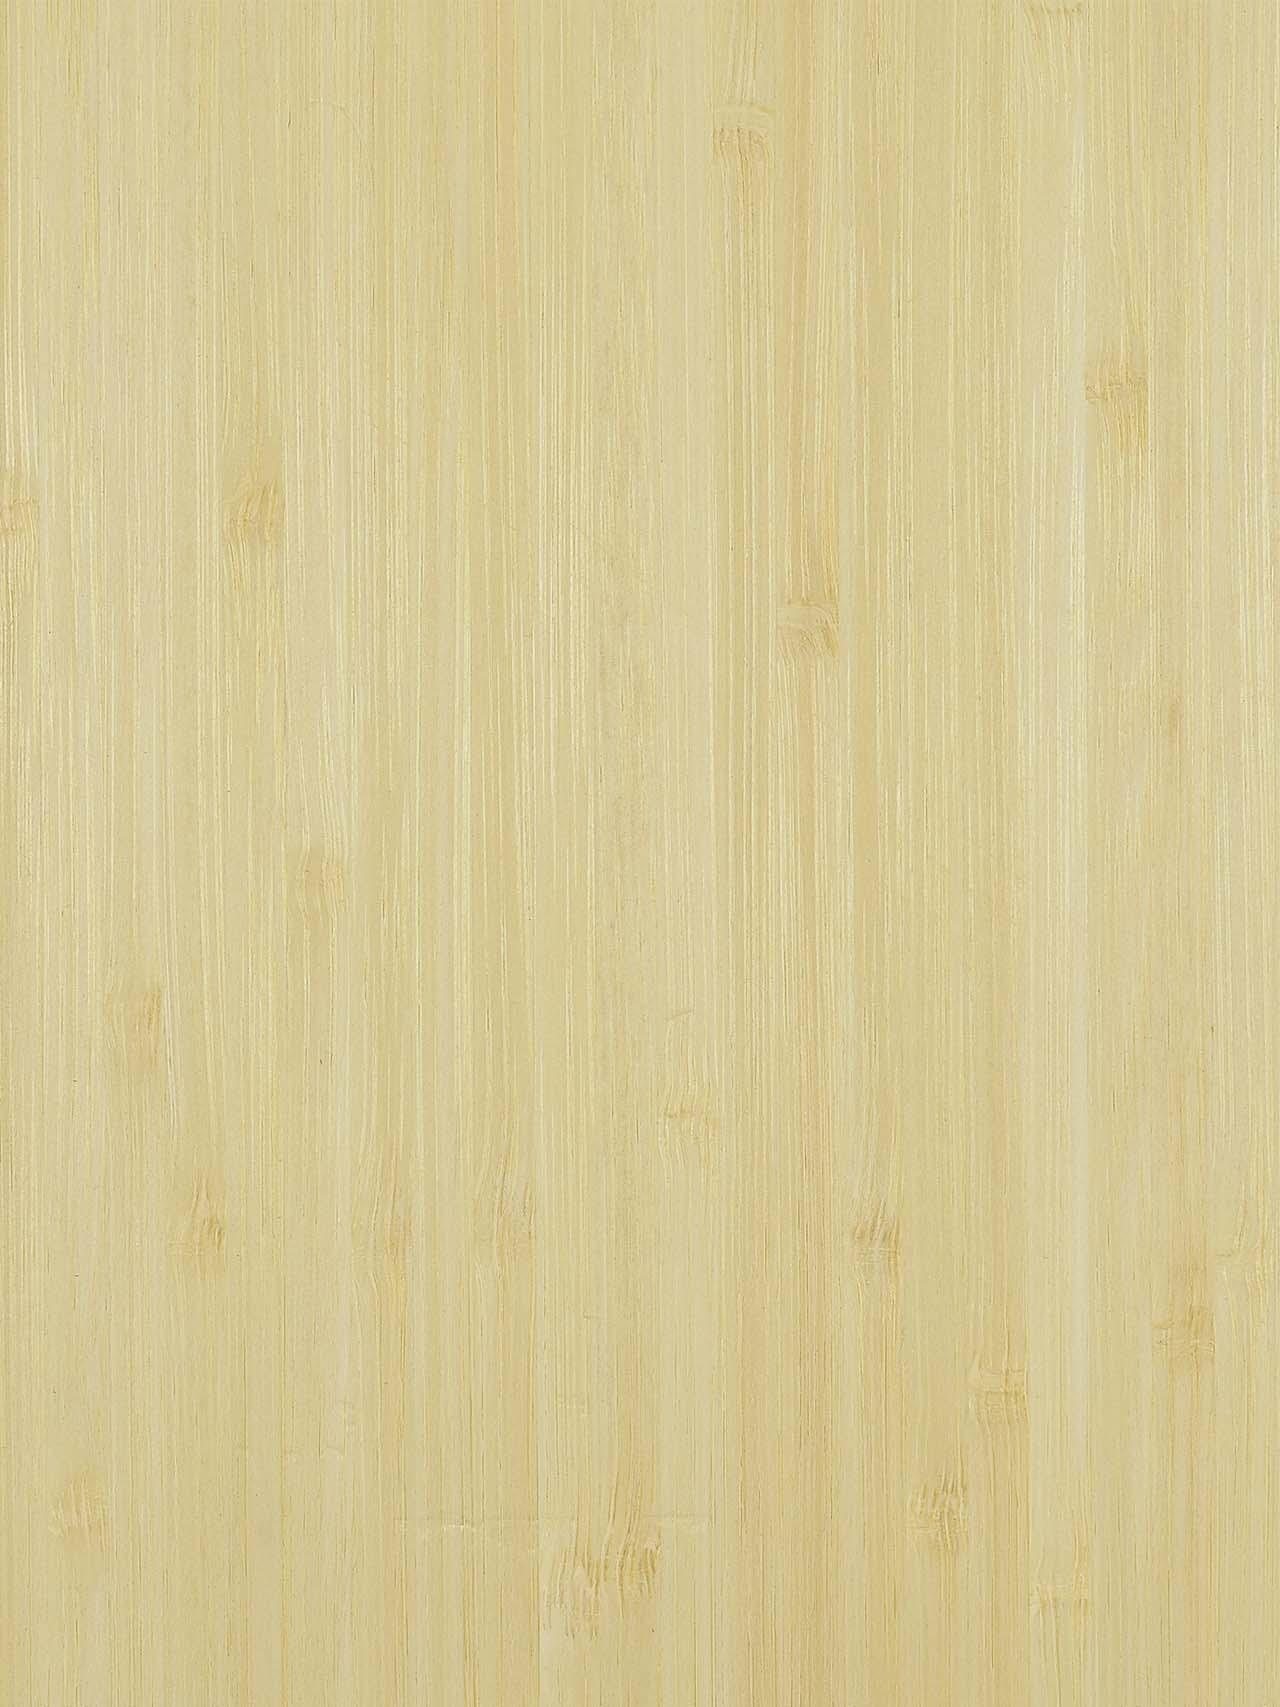 Panel Chapa Bambú Natural Prefabricado Losán